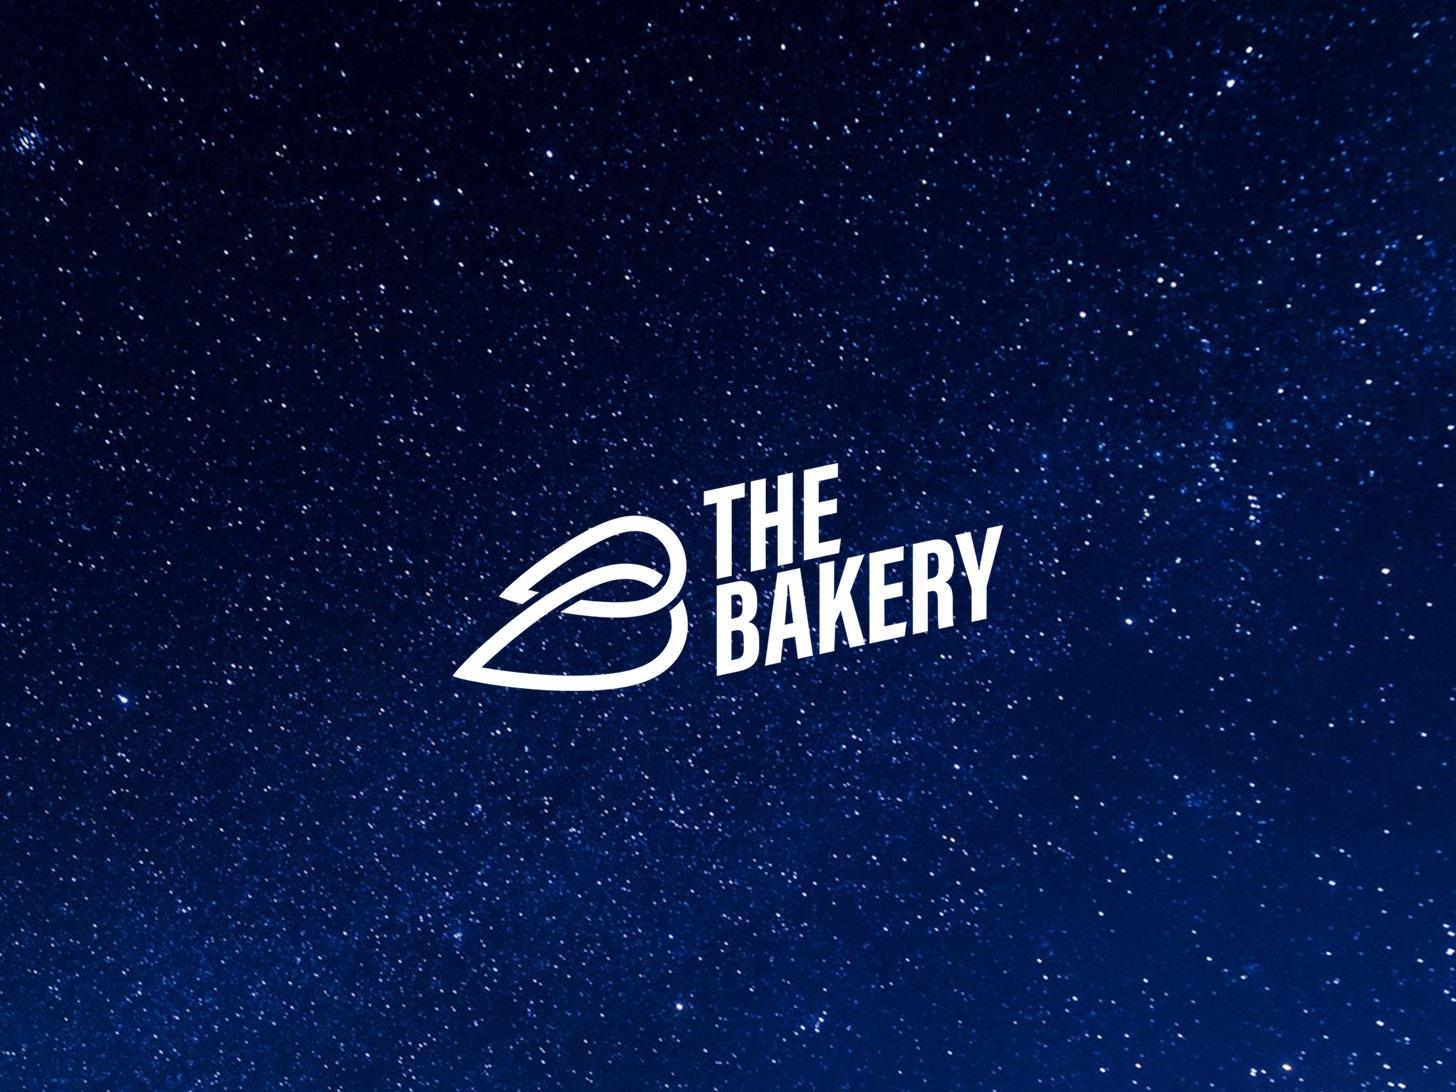 thebakery.jpg